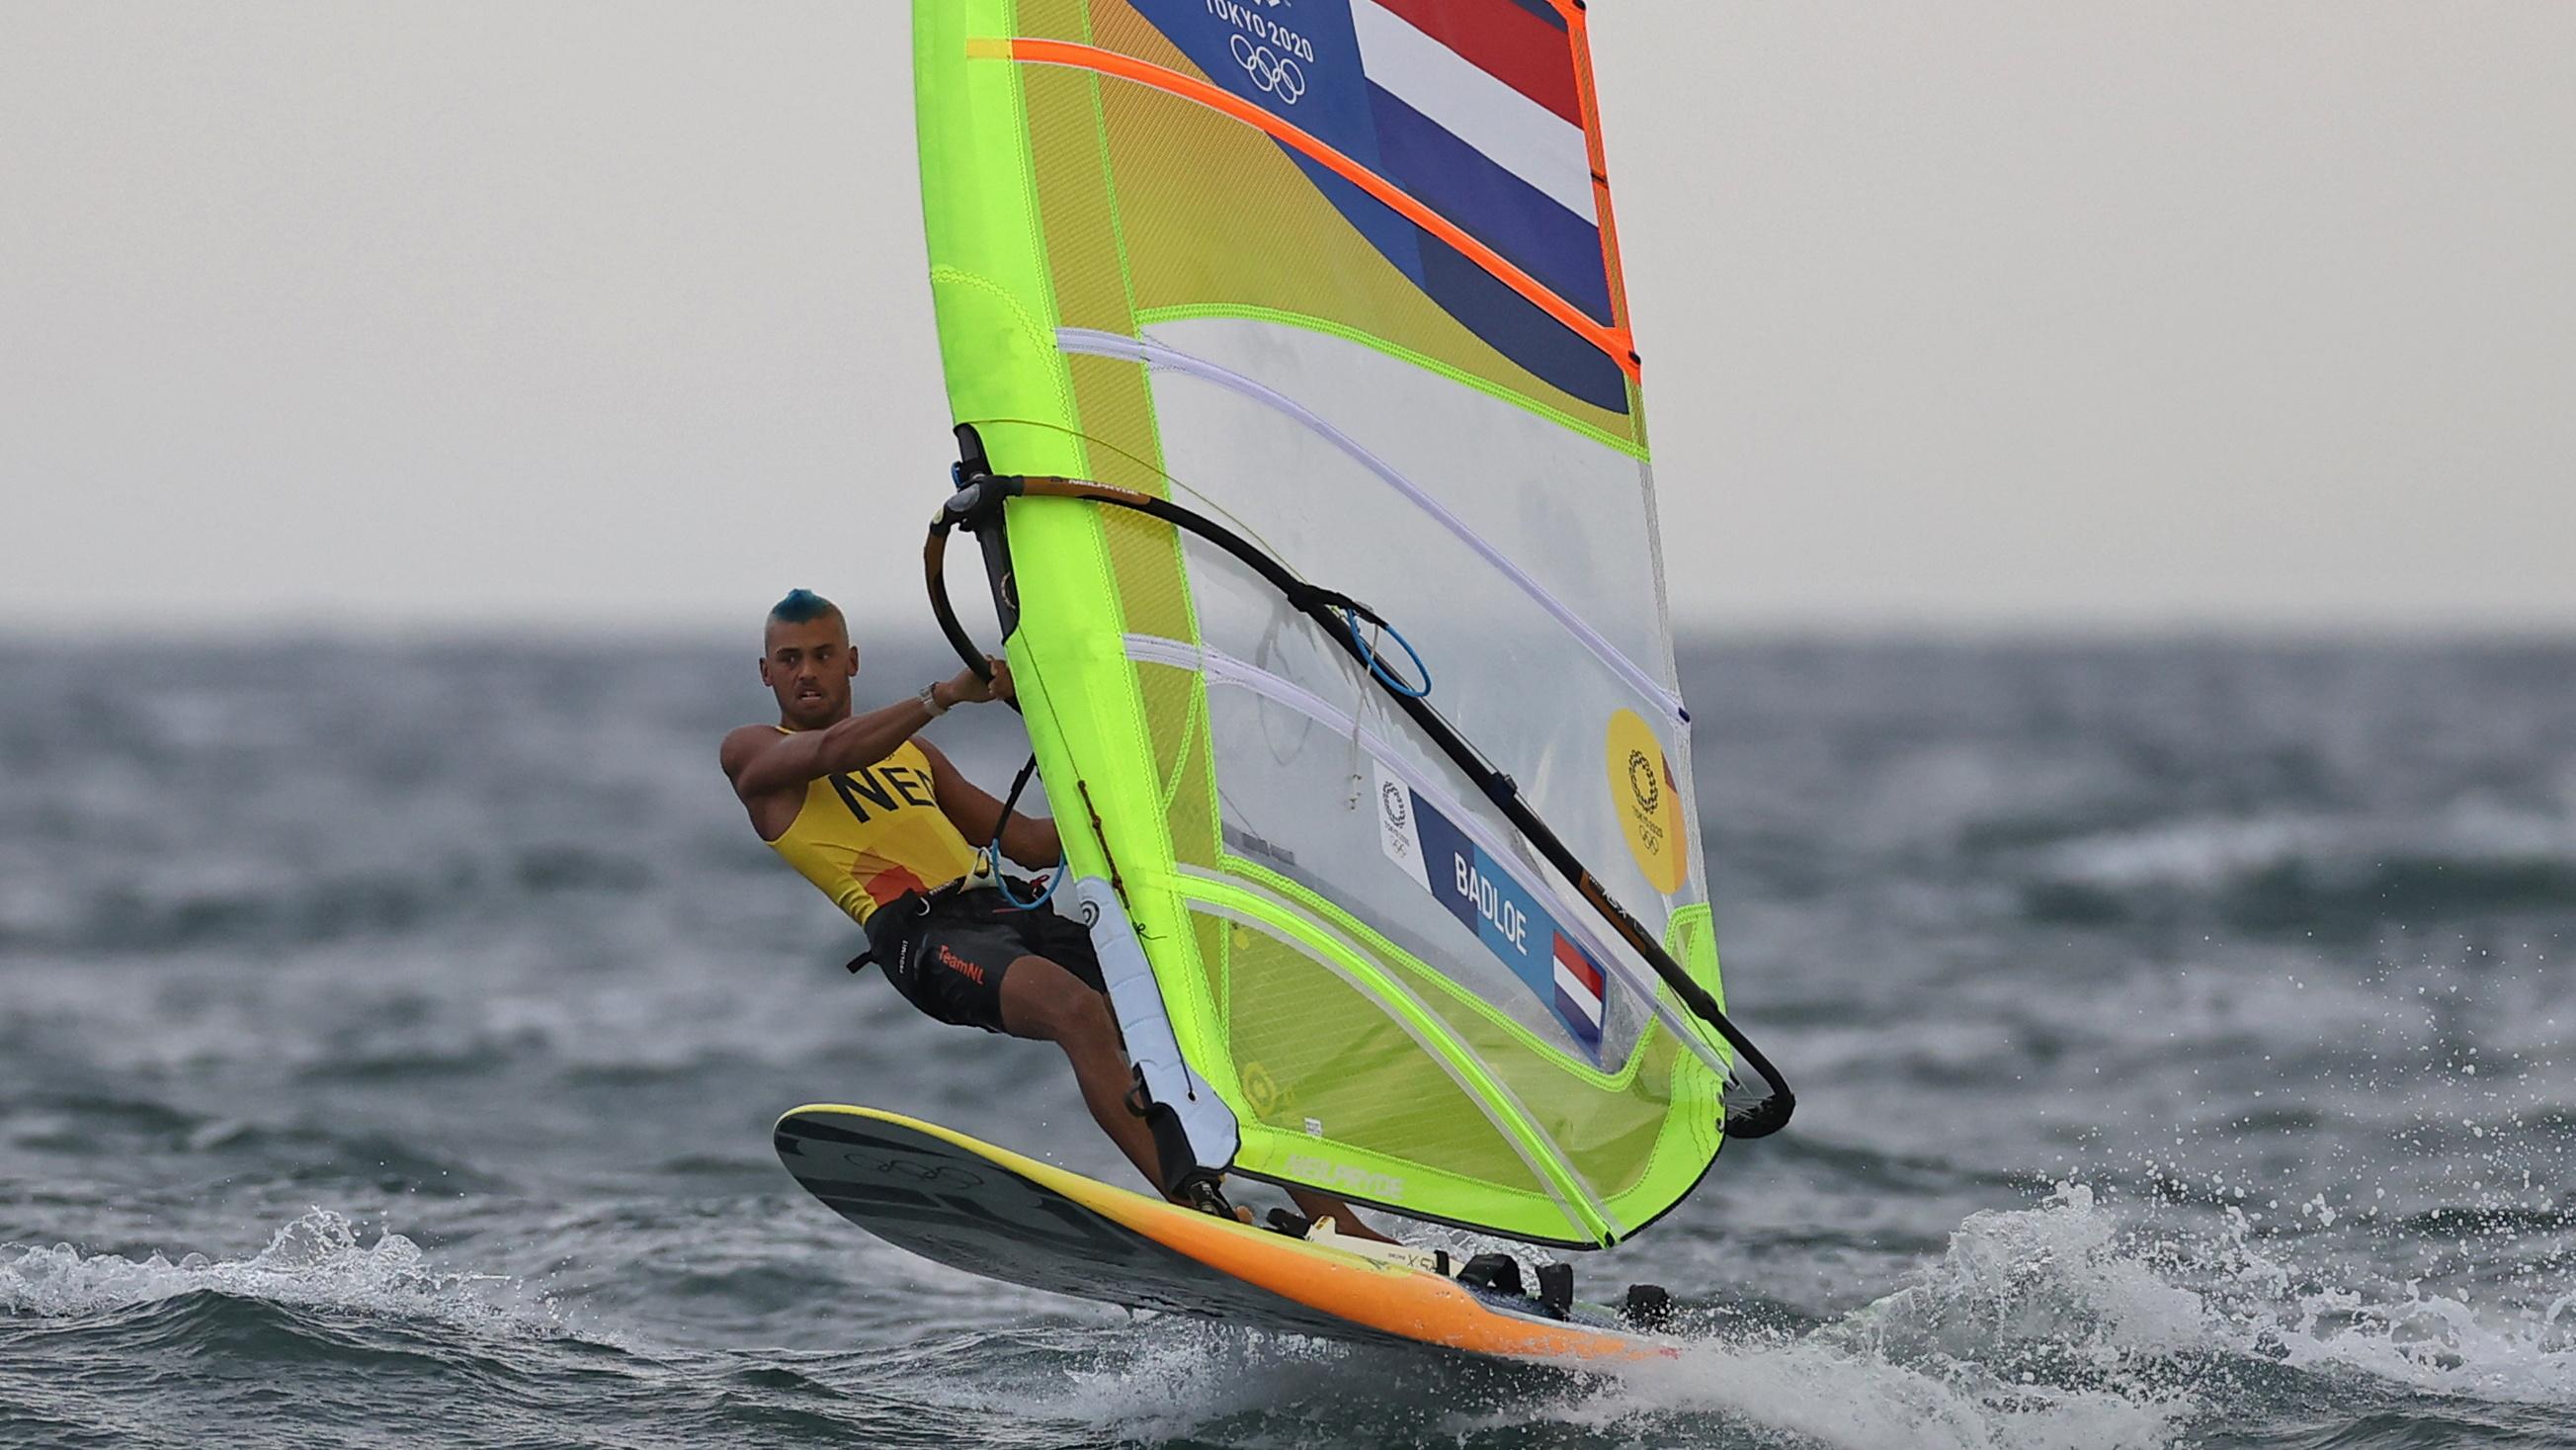 Tokyo 2020 Olympics - Sailing - Men's RS:X - Opening Series - Enoshima Yacht Harbour - Tokyo, Japan - July 29, 2021. Kiran Badloe of the Netherlands in action. REUTERS/Ivan Alvarado